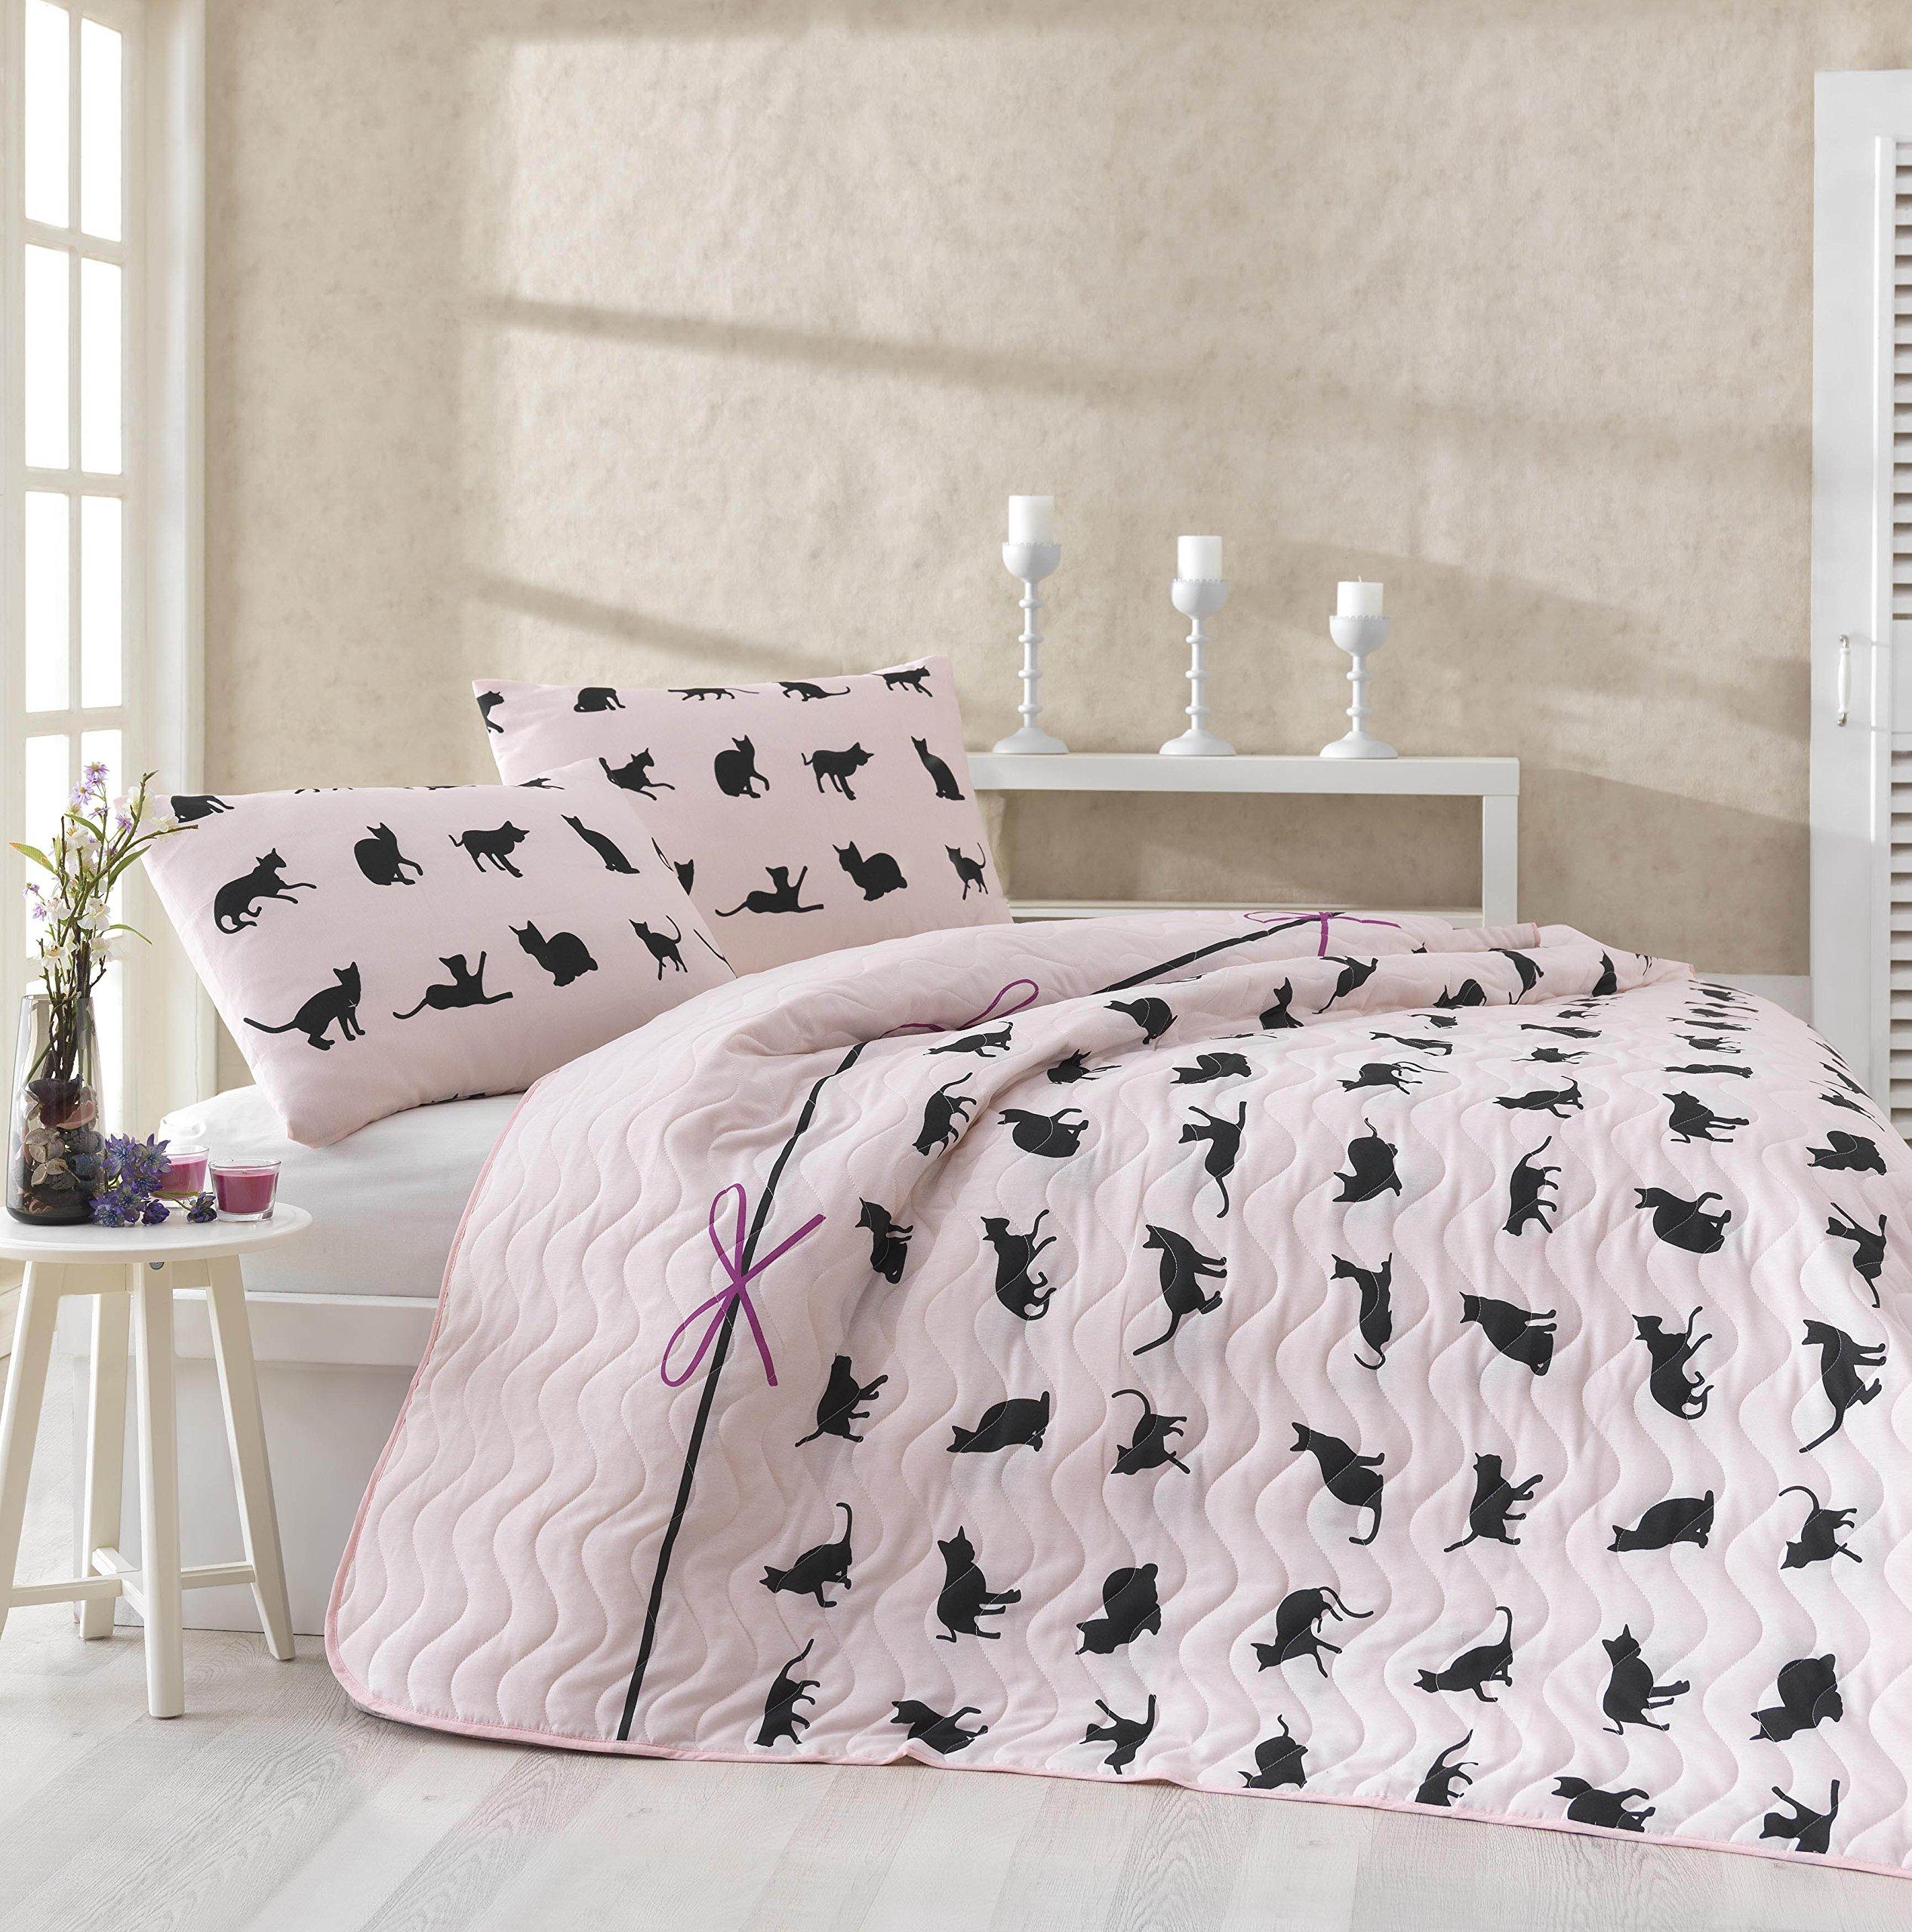 Cats Bedding, Full/Queen Size Bedspread/Coverlet Set, Cats Themed Girls Bedding, 3 PCS, Powder